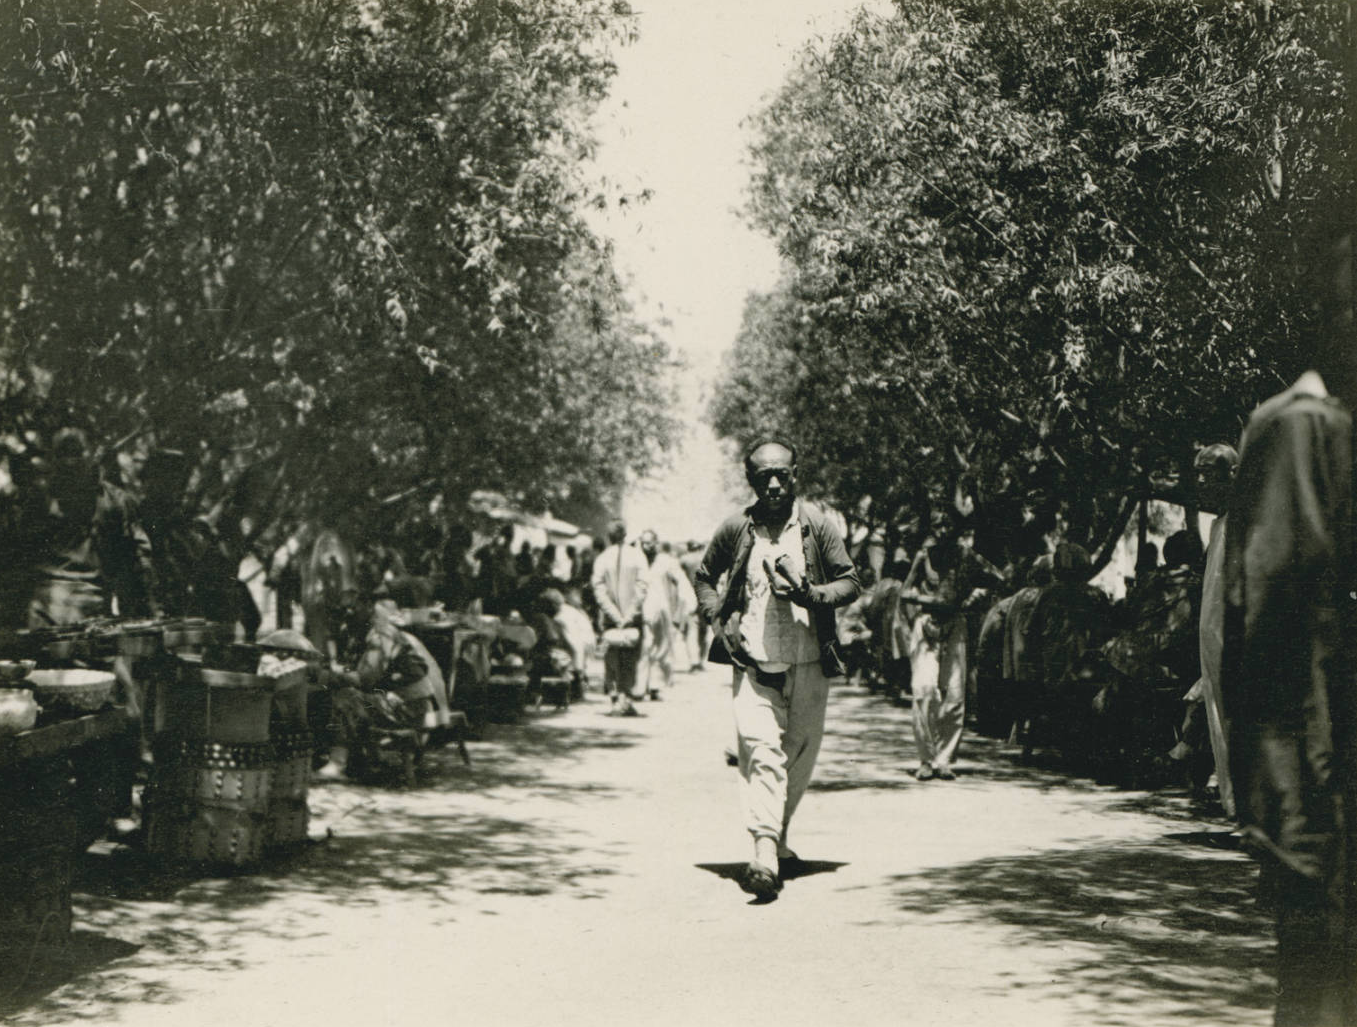 Lane of peddlar's stands, 1909-06